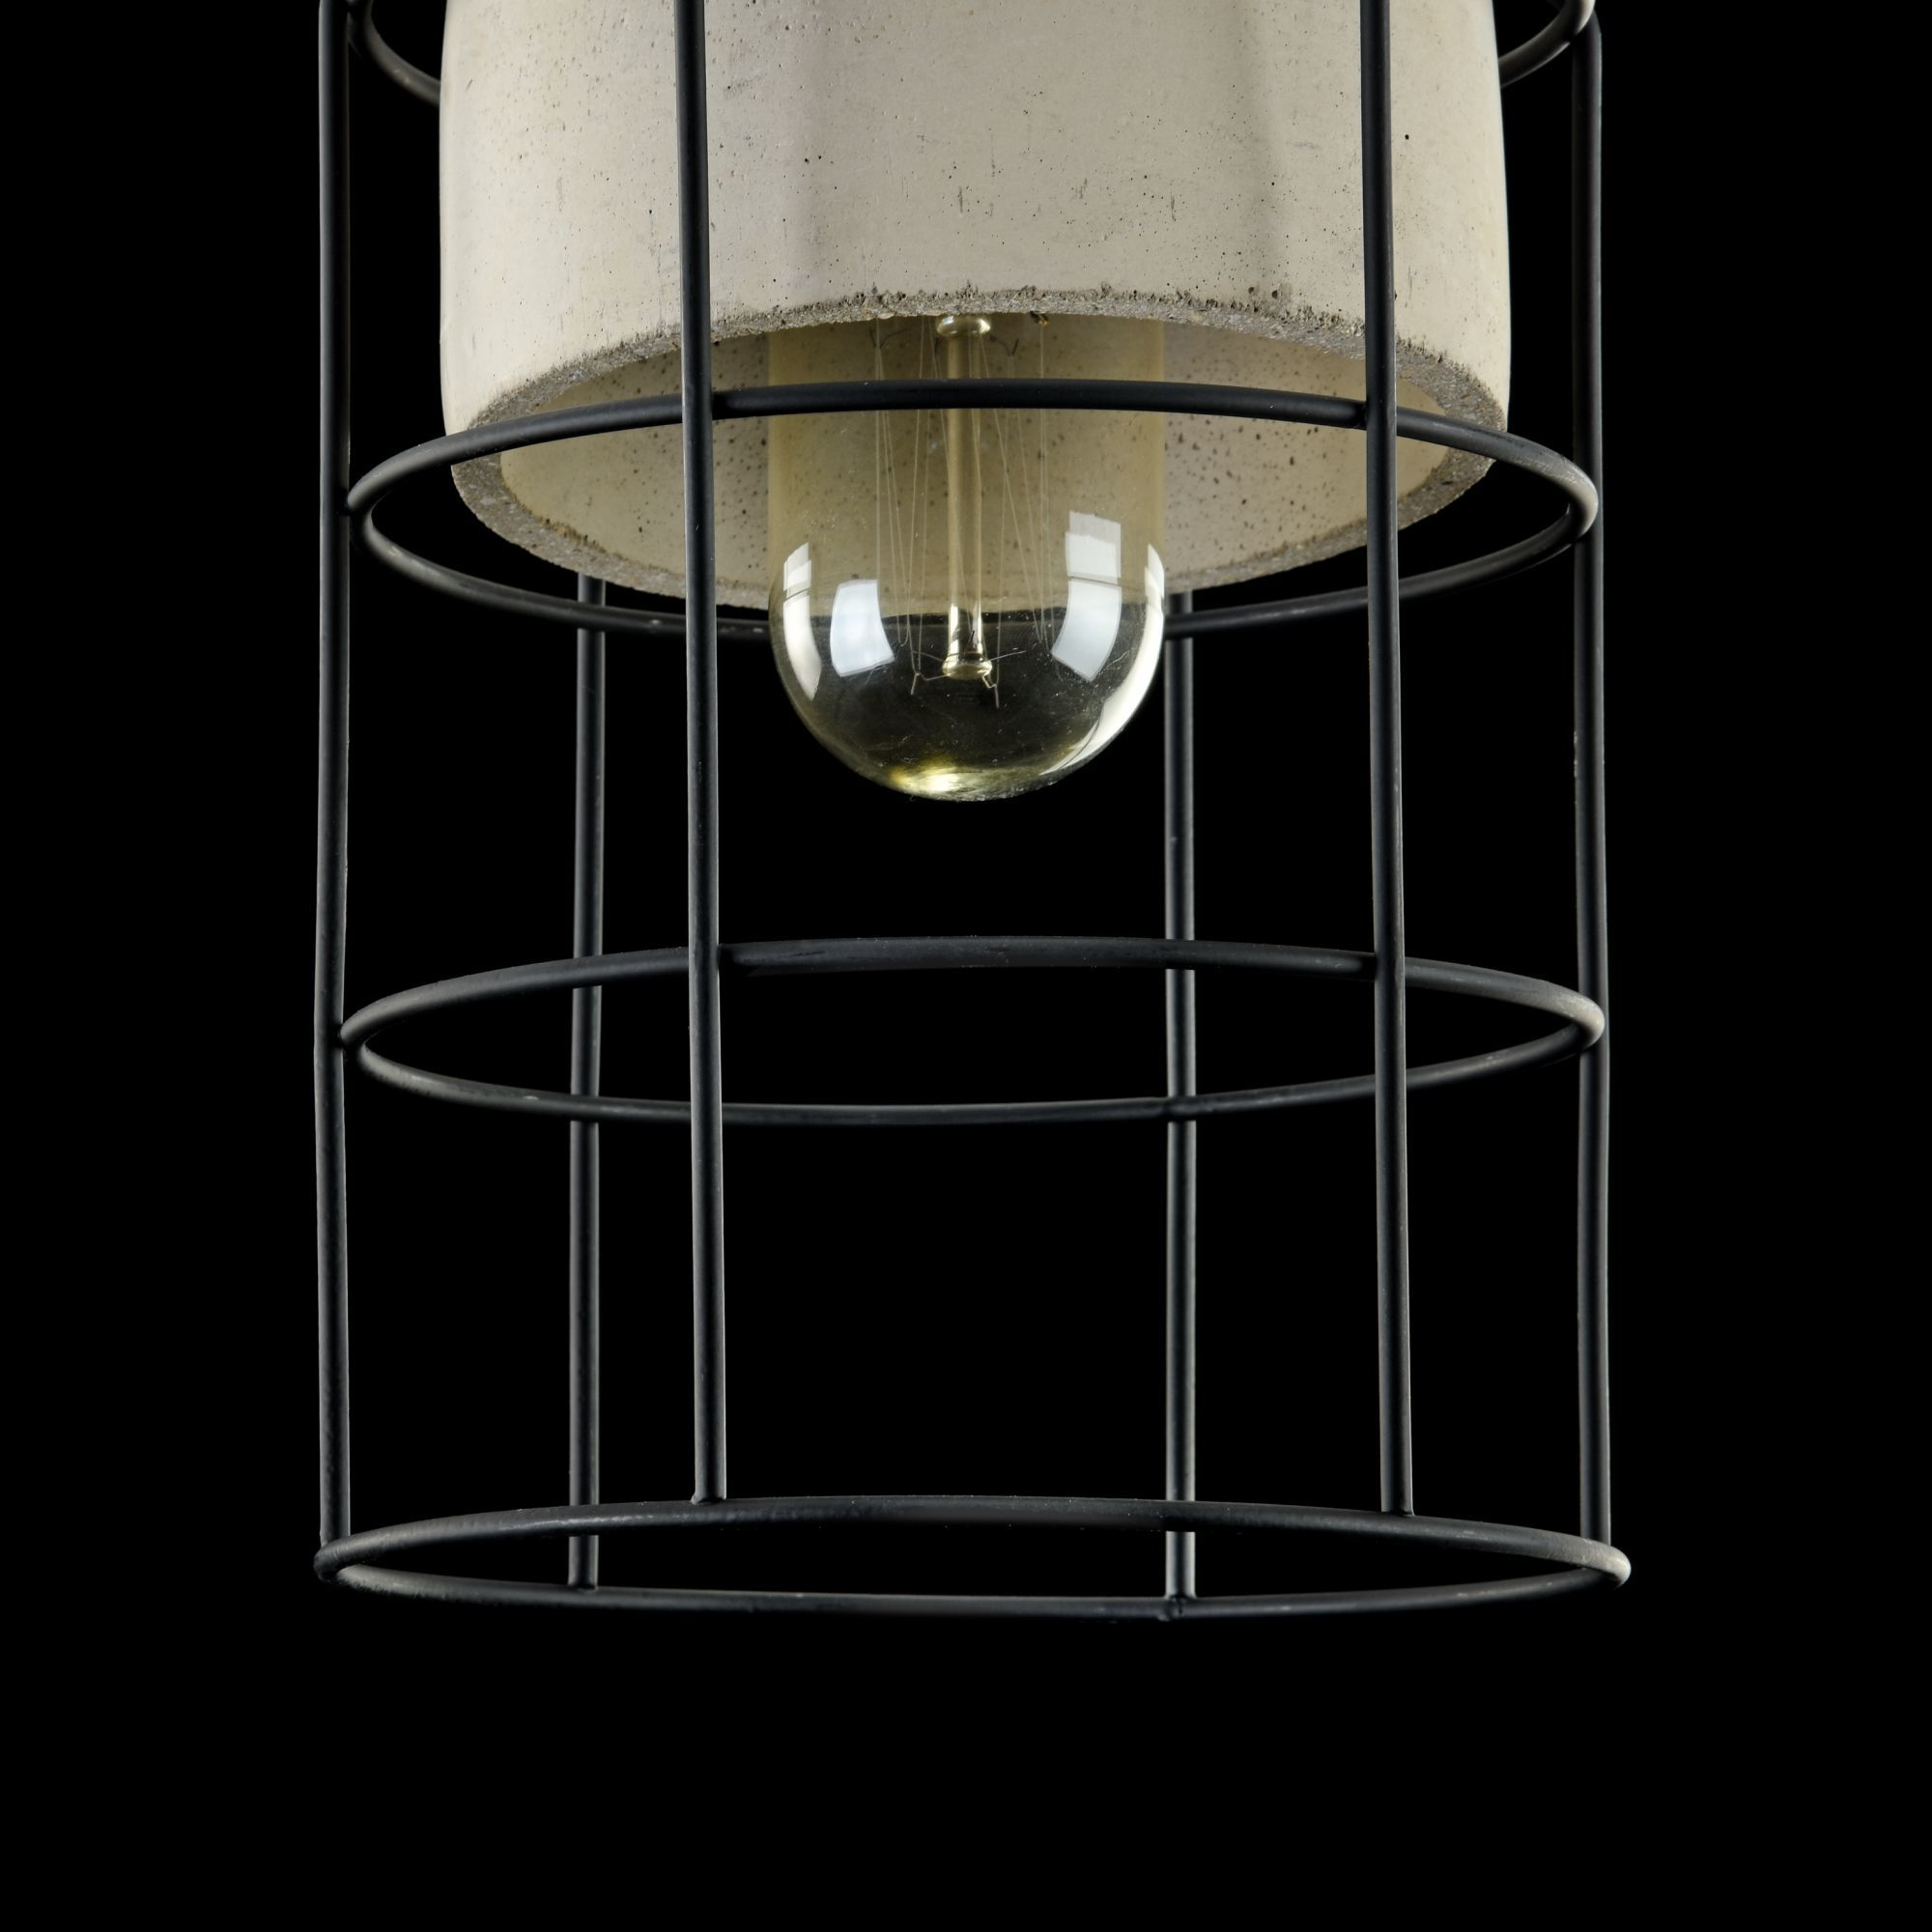 Подвесной светильник Maytoni Gosford T441-PL-01-GR, 1xE27x60W, черный, серый, металл, бетон - фото 6